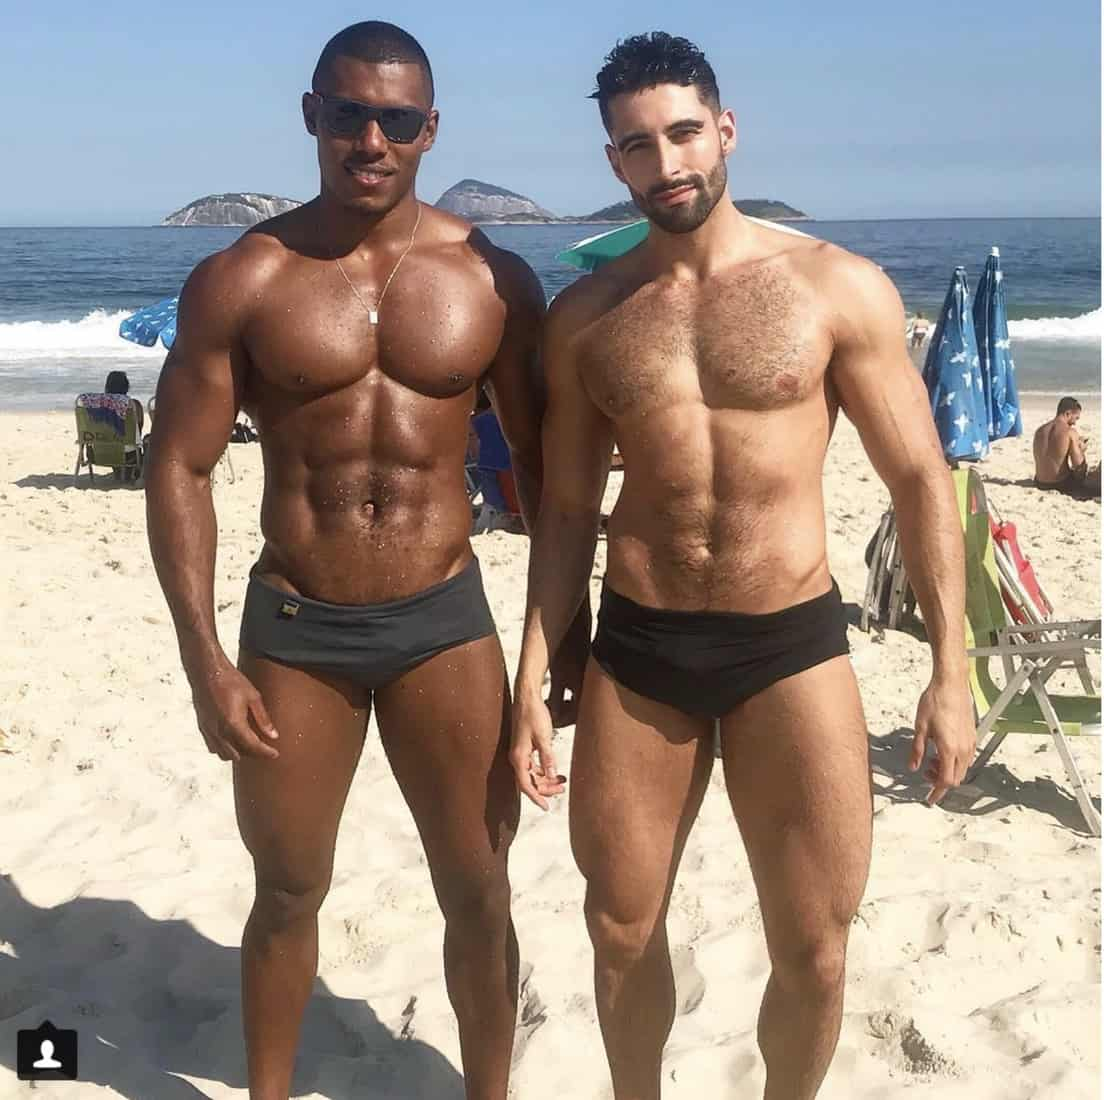 Gay dating site highland springs virginia